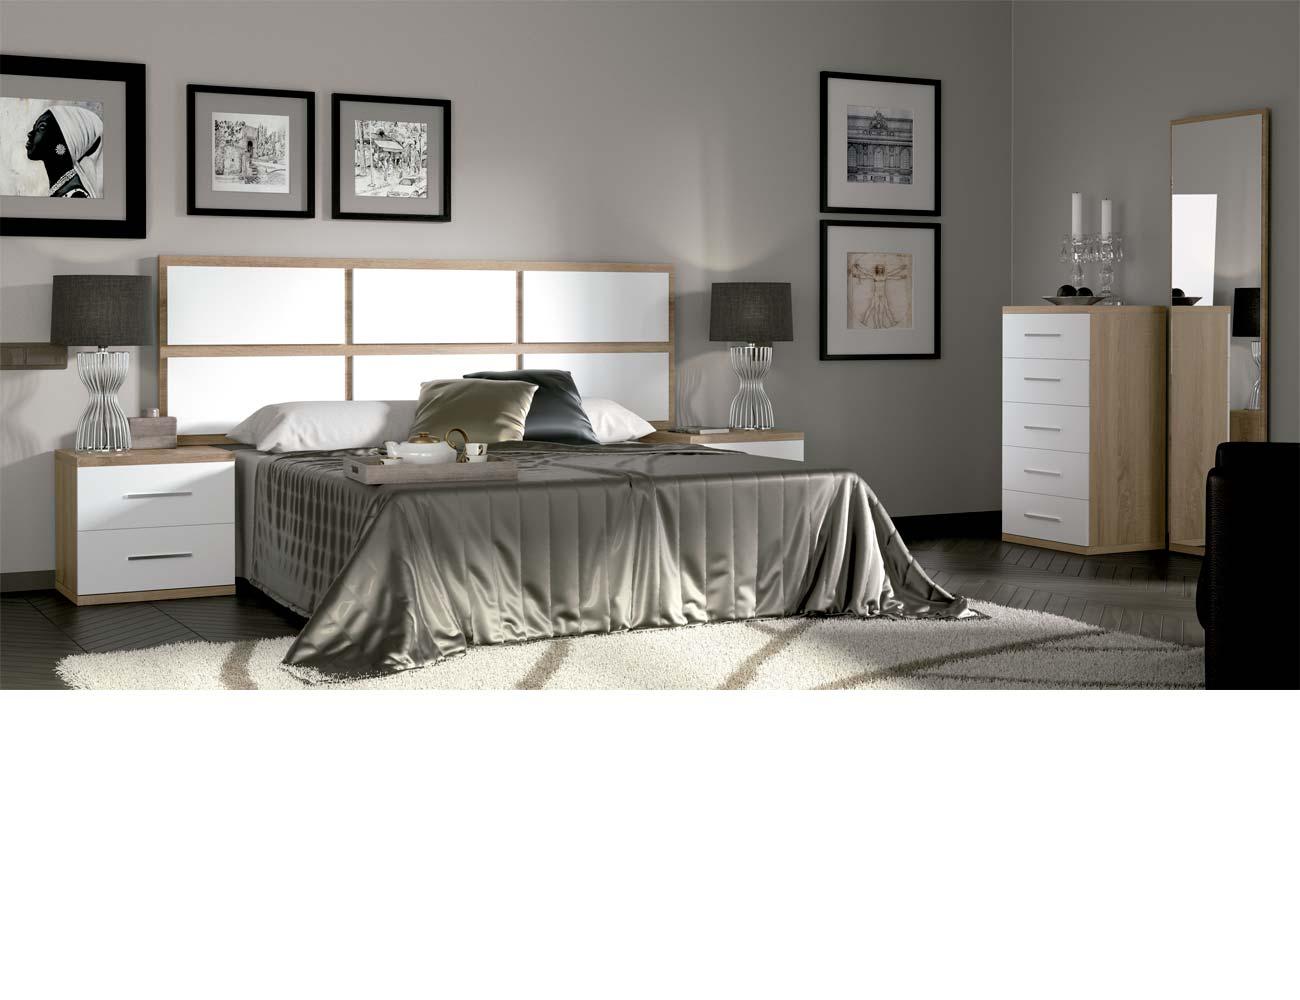 Dormitorio matrimonio moderno 32 cambrian blanco